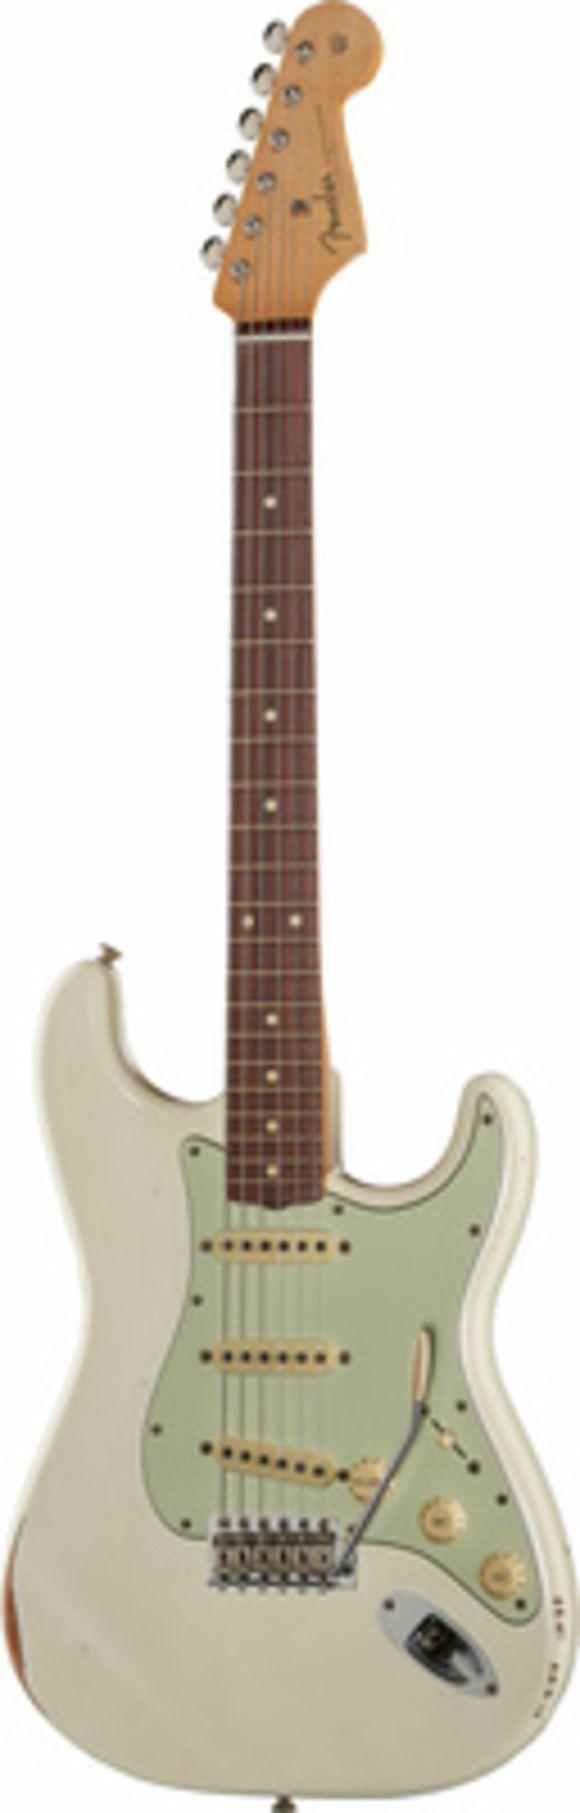 Road Worn 60 Stratocaster OWT Fender